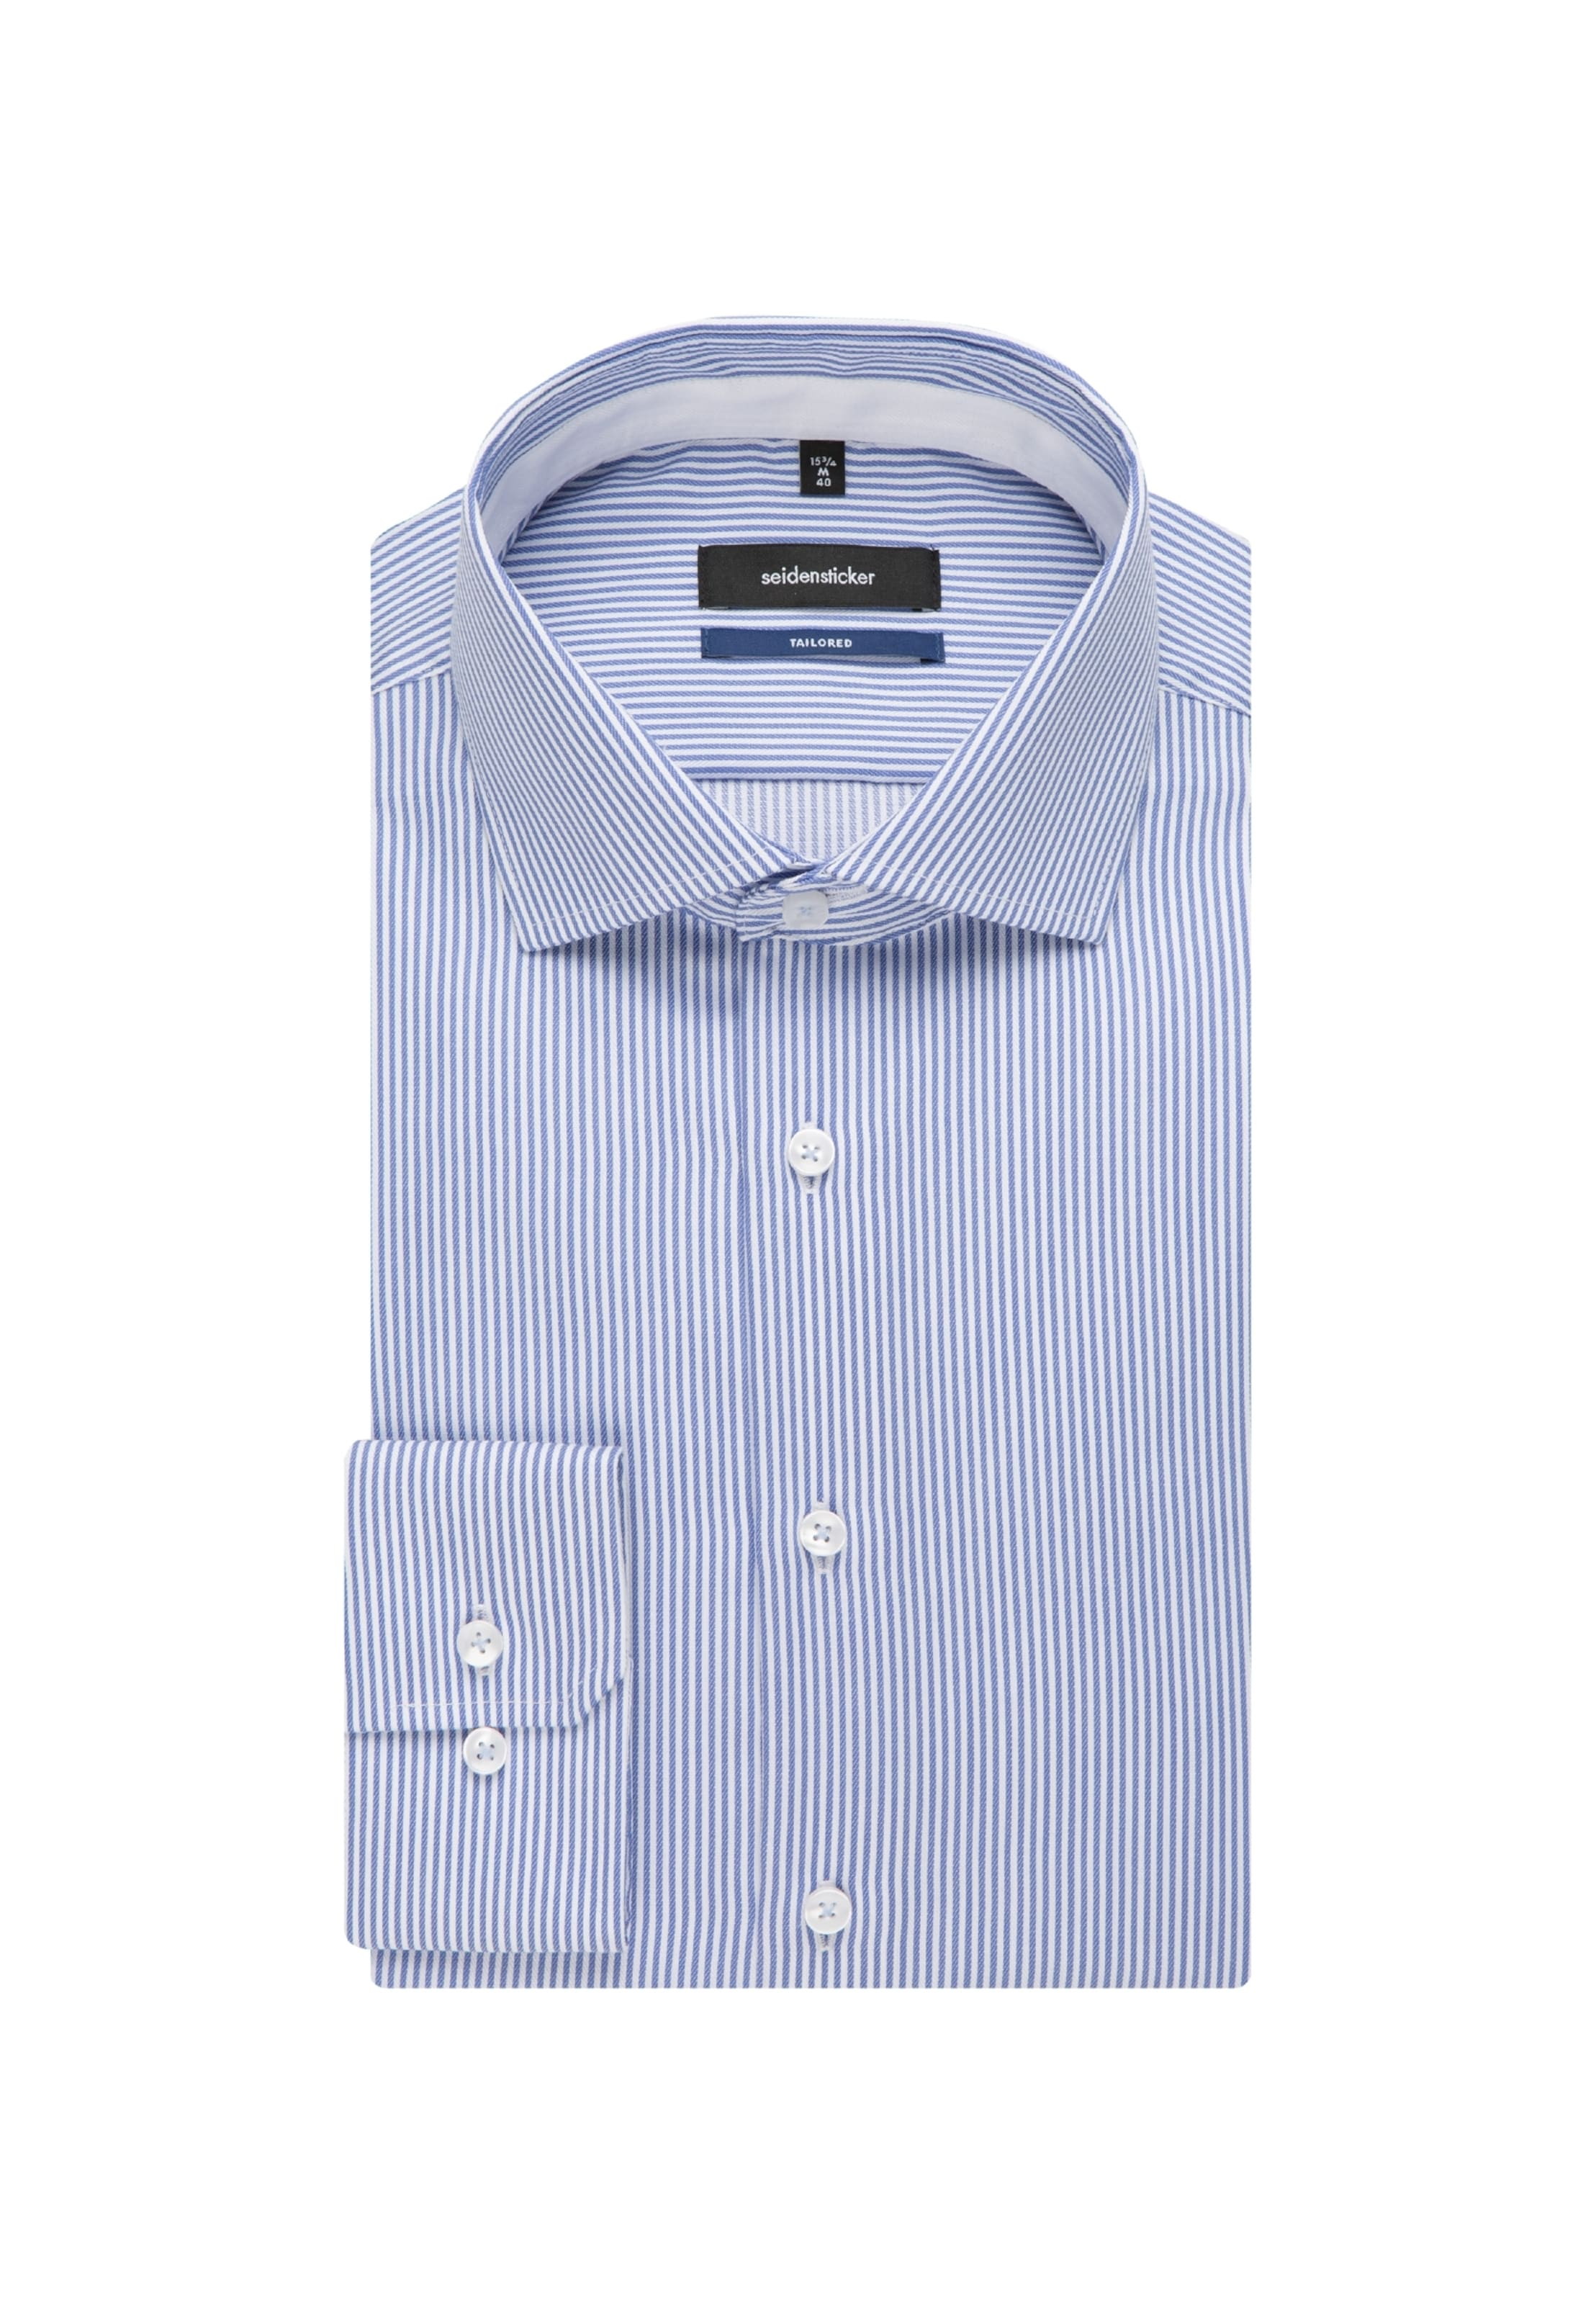 Blau Business Hemd Tailored In Seidensticker ' xeWCdrBo